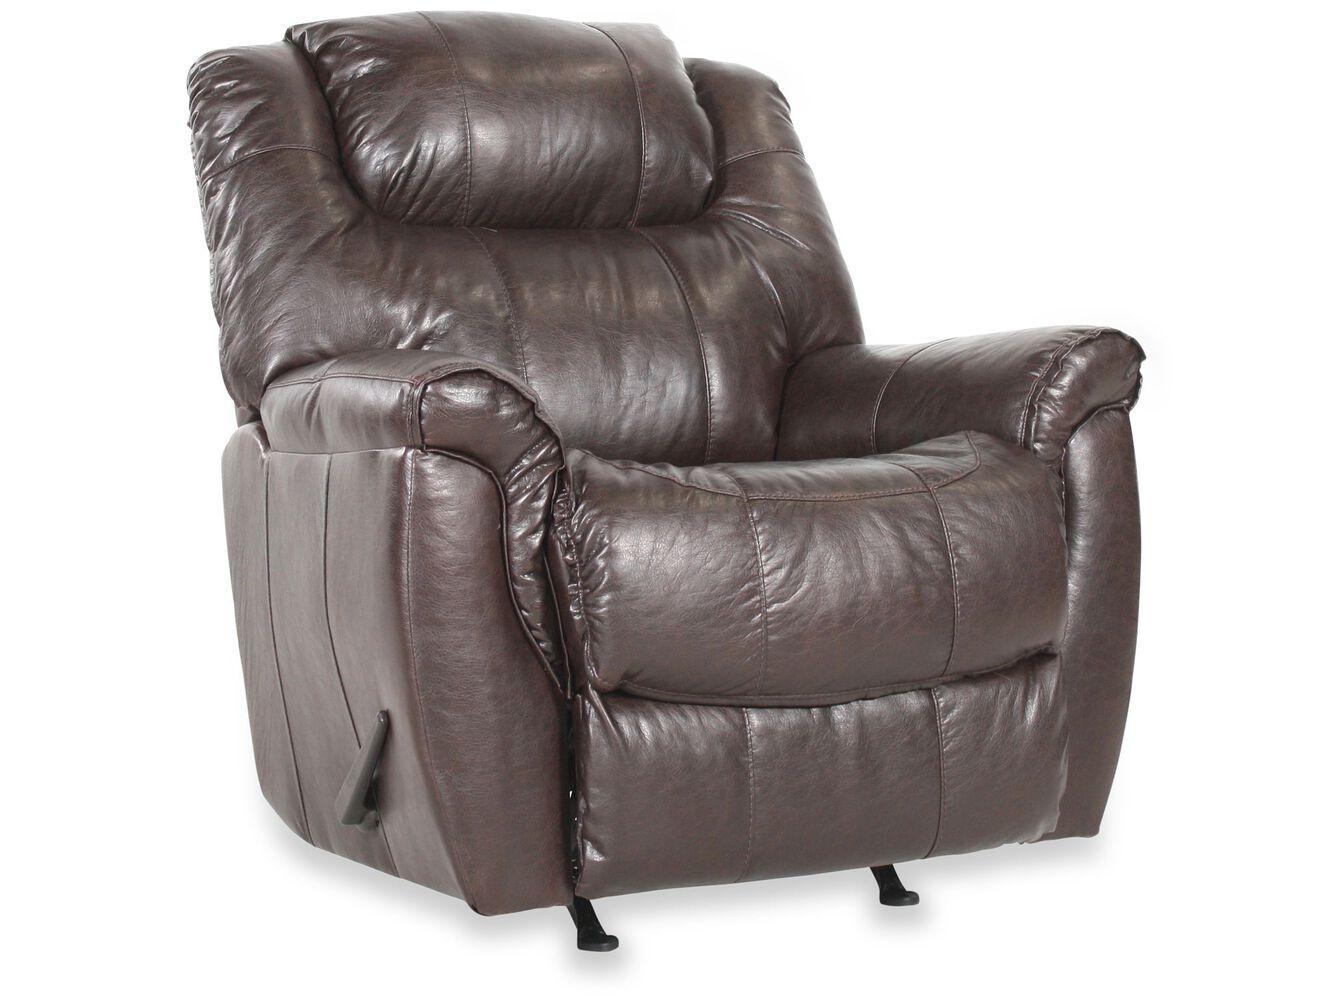 Zero gravity traditional 41 recliner in dark brown - Zero gravity recliner chair for living room ...